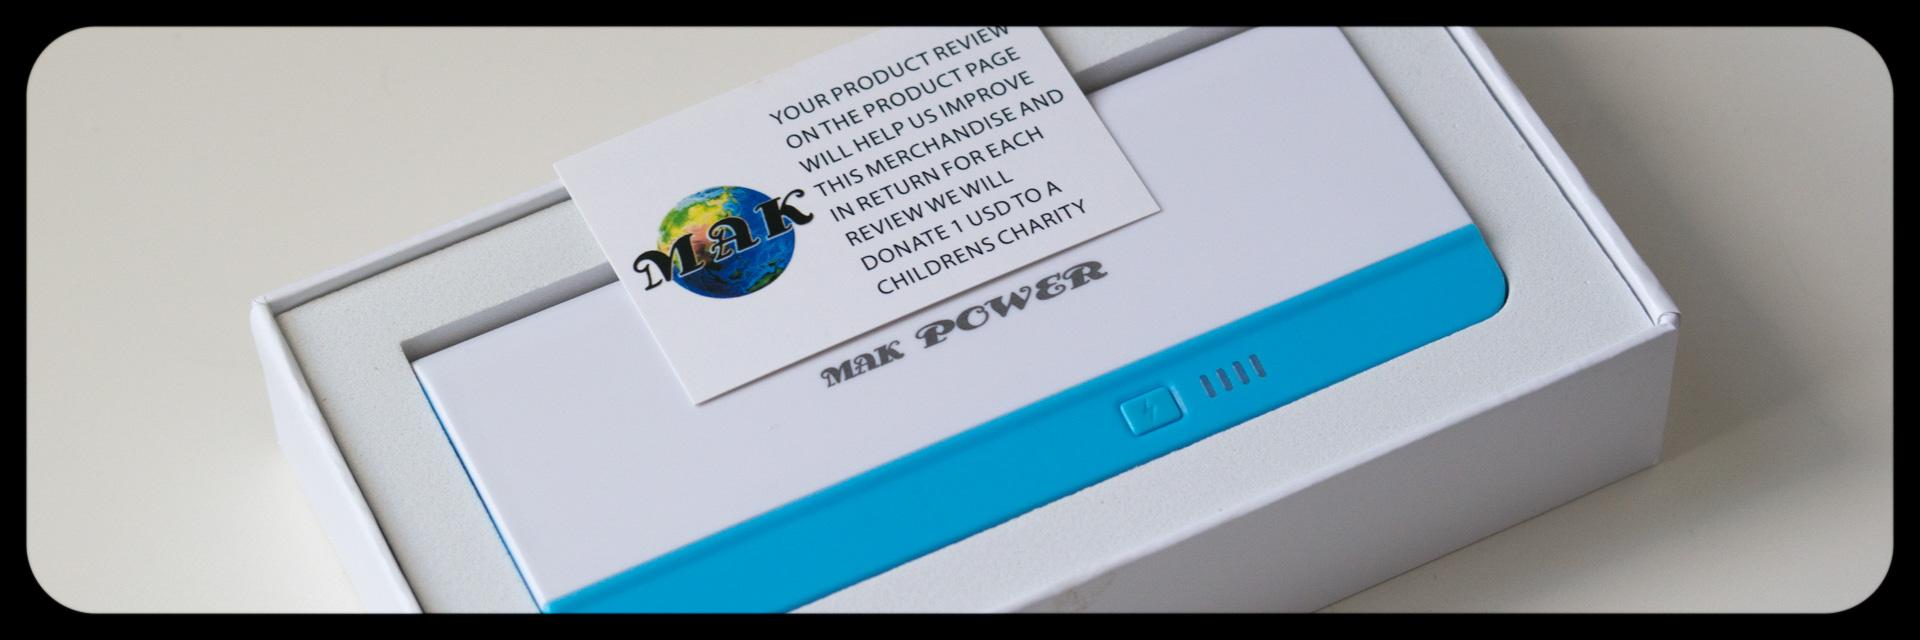 MAK POWER 10000mAh Brilliant Dual USB (2.1A / 1.5A Output) Bewegliche Energien-Bank-externes Ladegerät